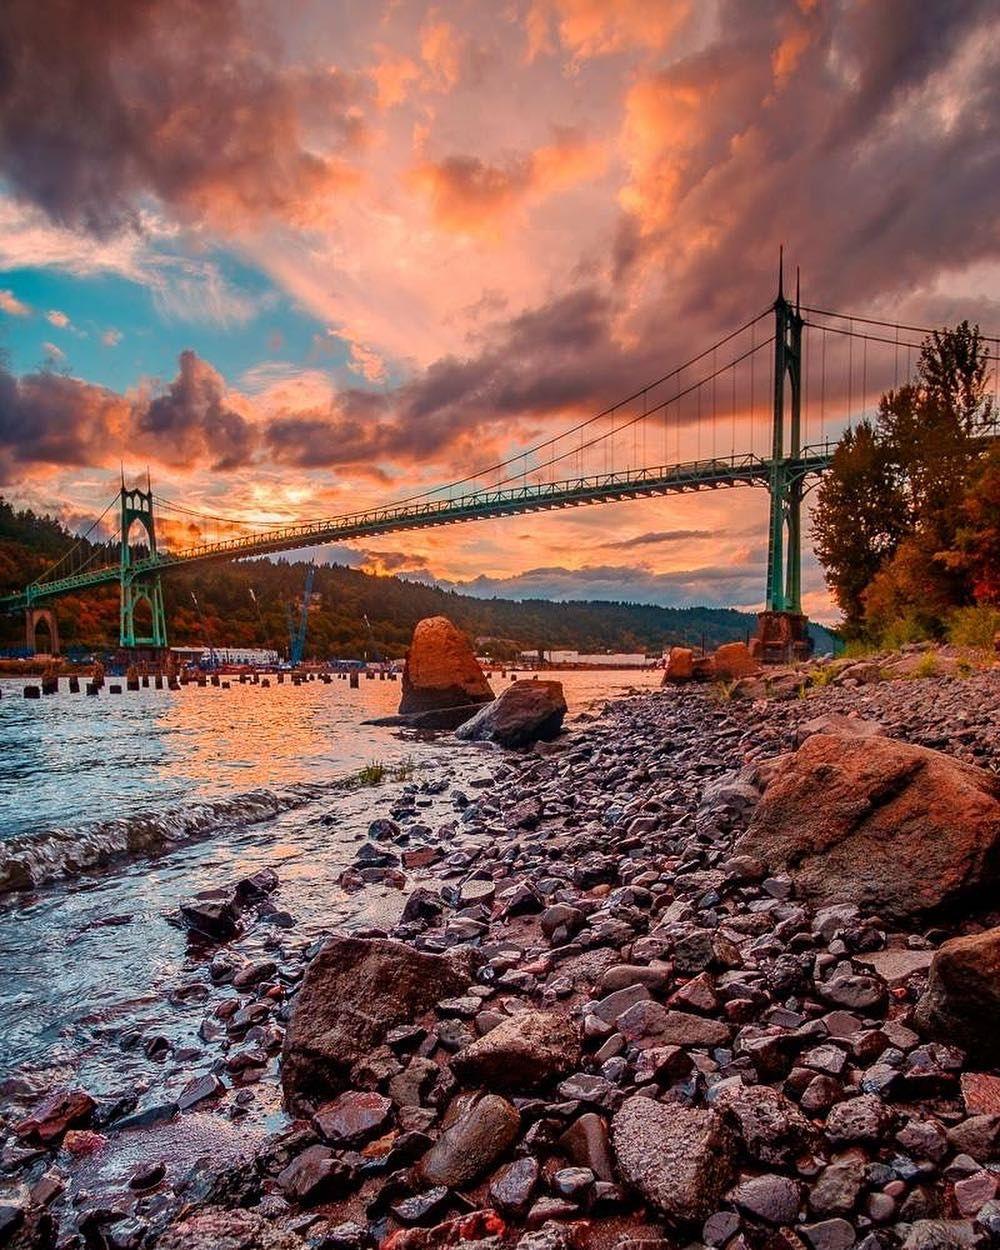 "Clifford Paguio on Instagram: ""St. Johns Bridge in Portland Oregon  #sunset #oregonian #oregonnw #oregon #p #pnw🌲 #pnw #pnw🌲 #pnwlove #pnwlife #pnwphotographer…"""